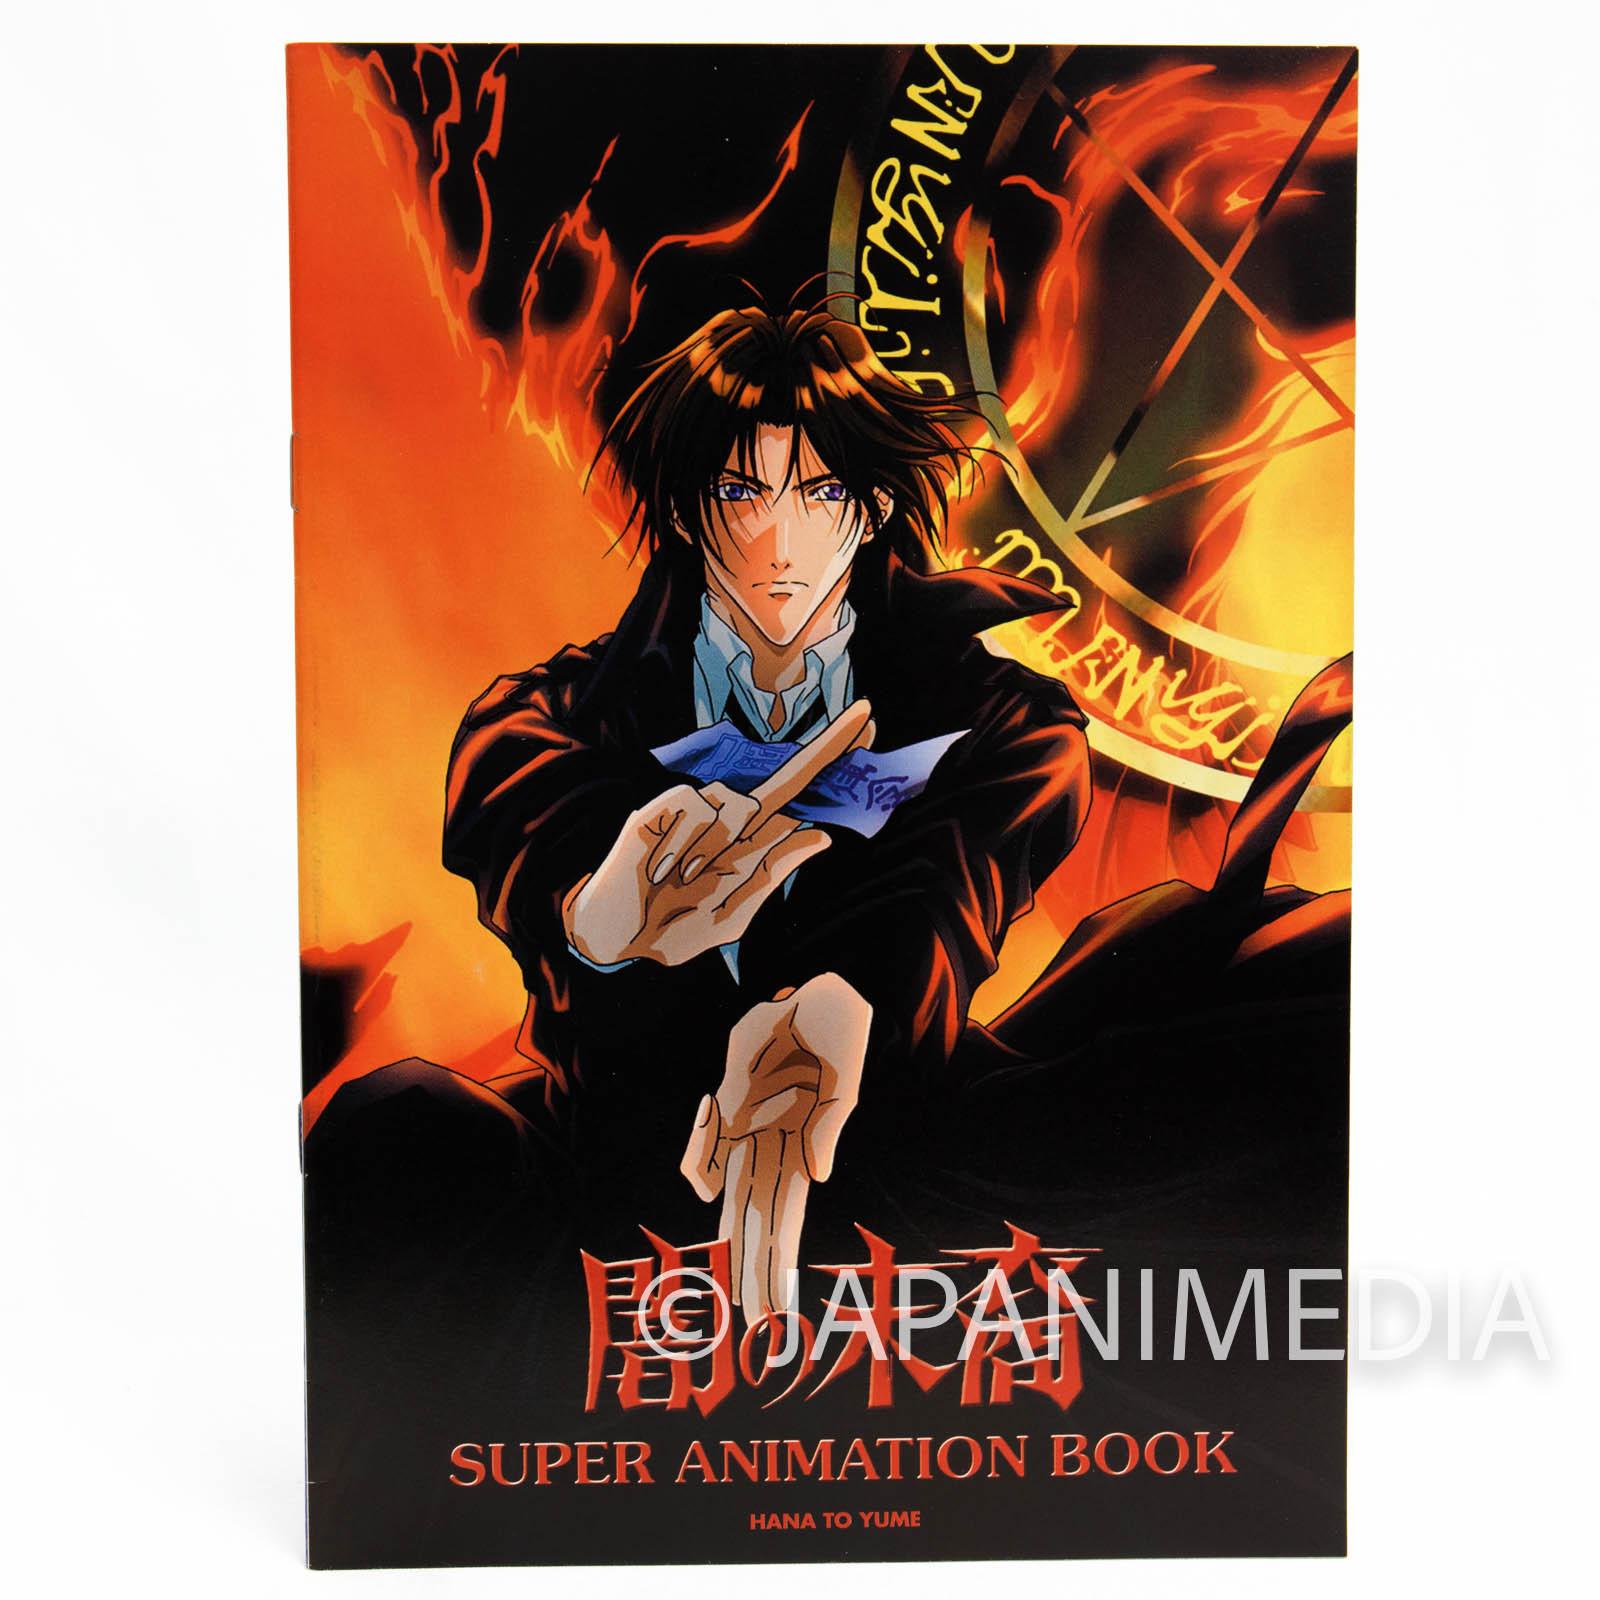 Descendants of Darkness Super Animation Book Hana to Yume JAPAN ANIME